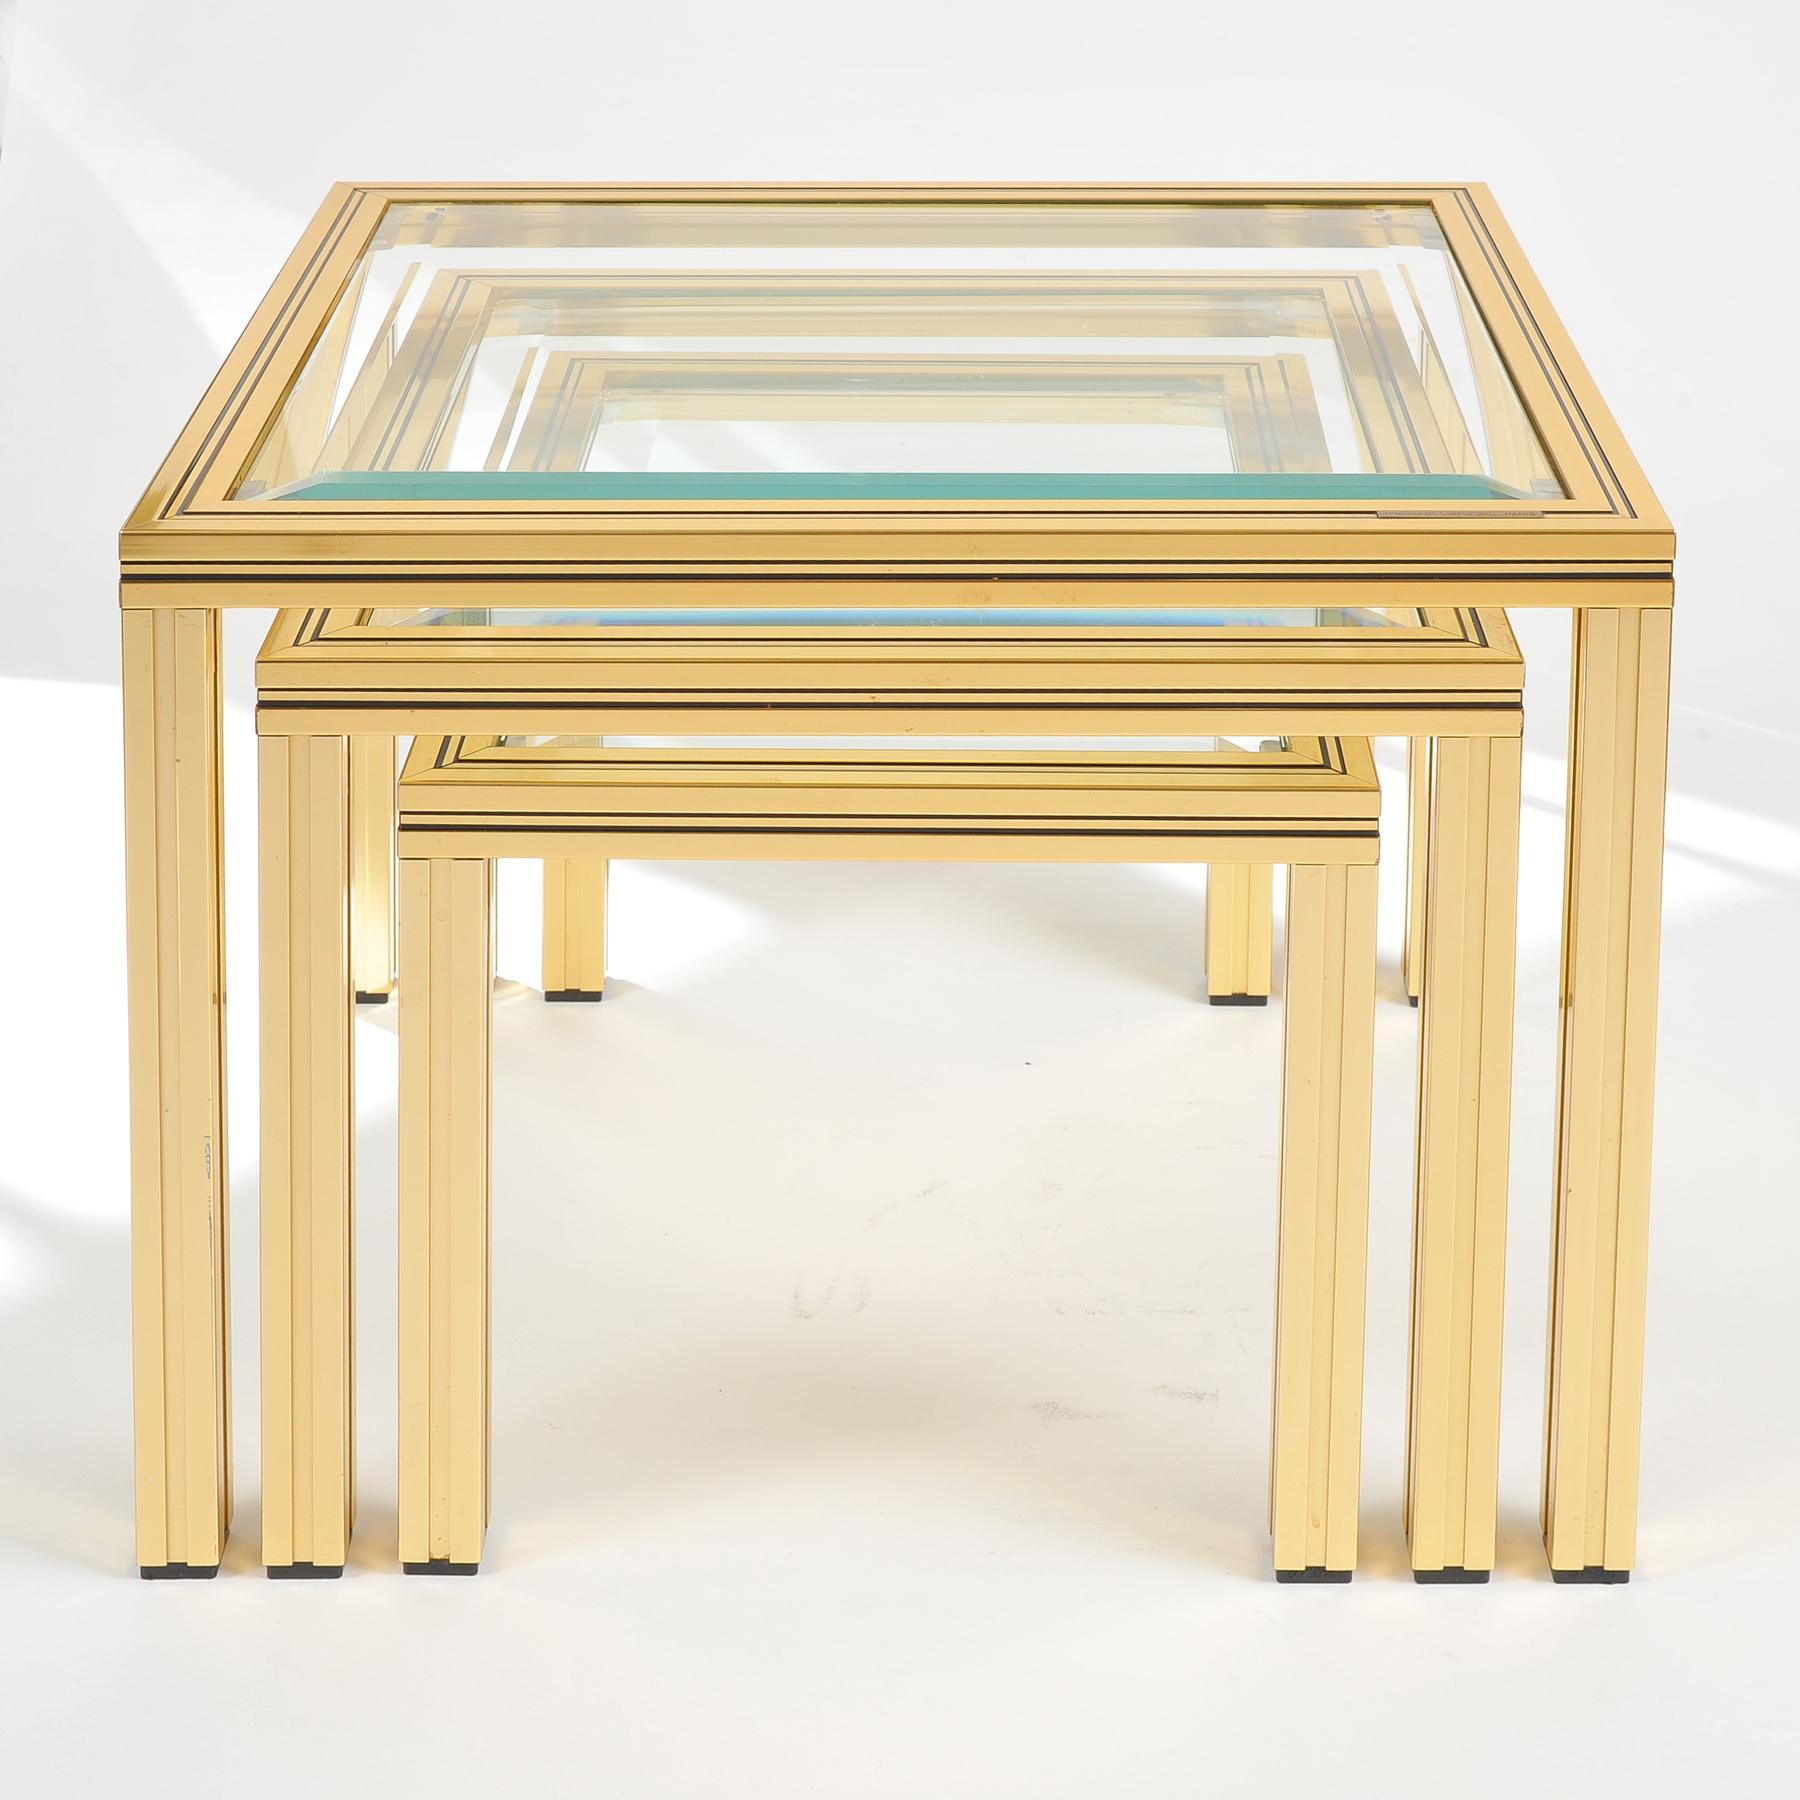 Nest of tables by Pierre Vandel